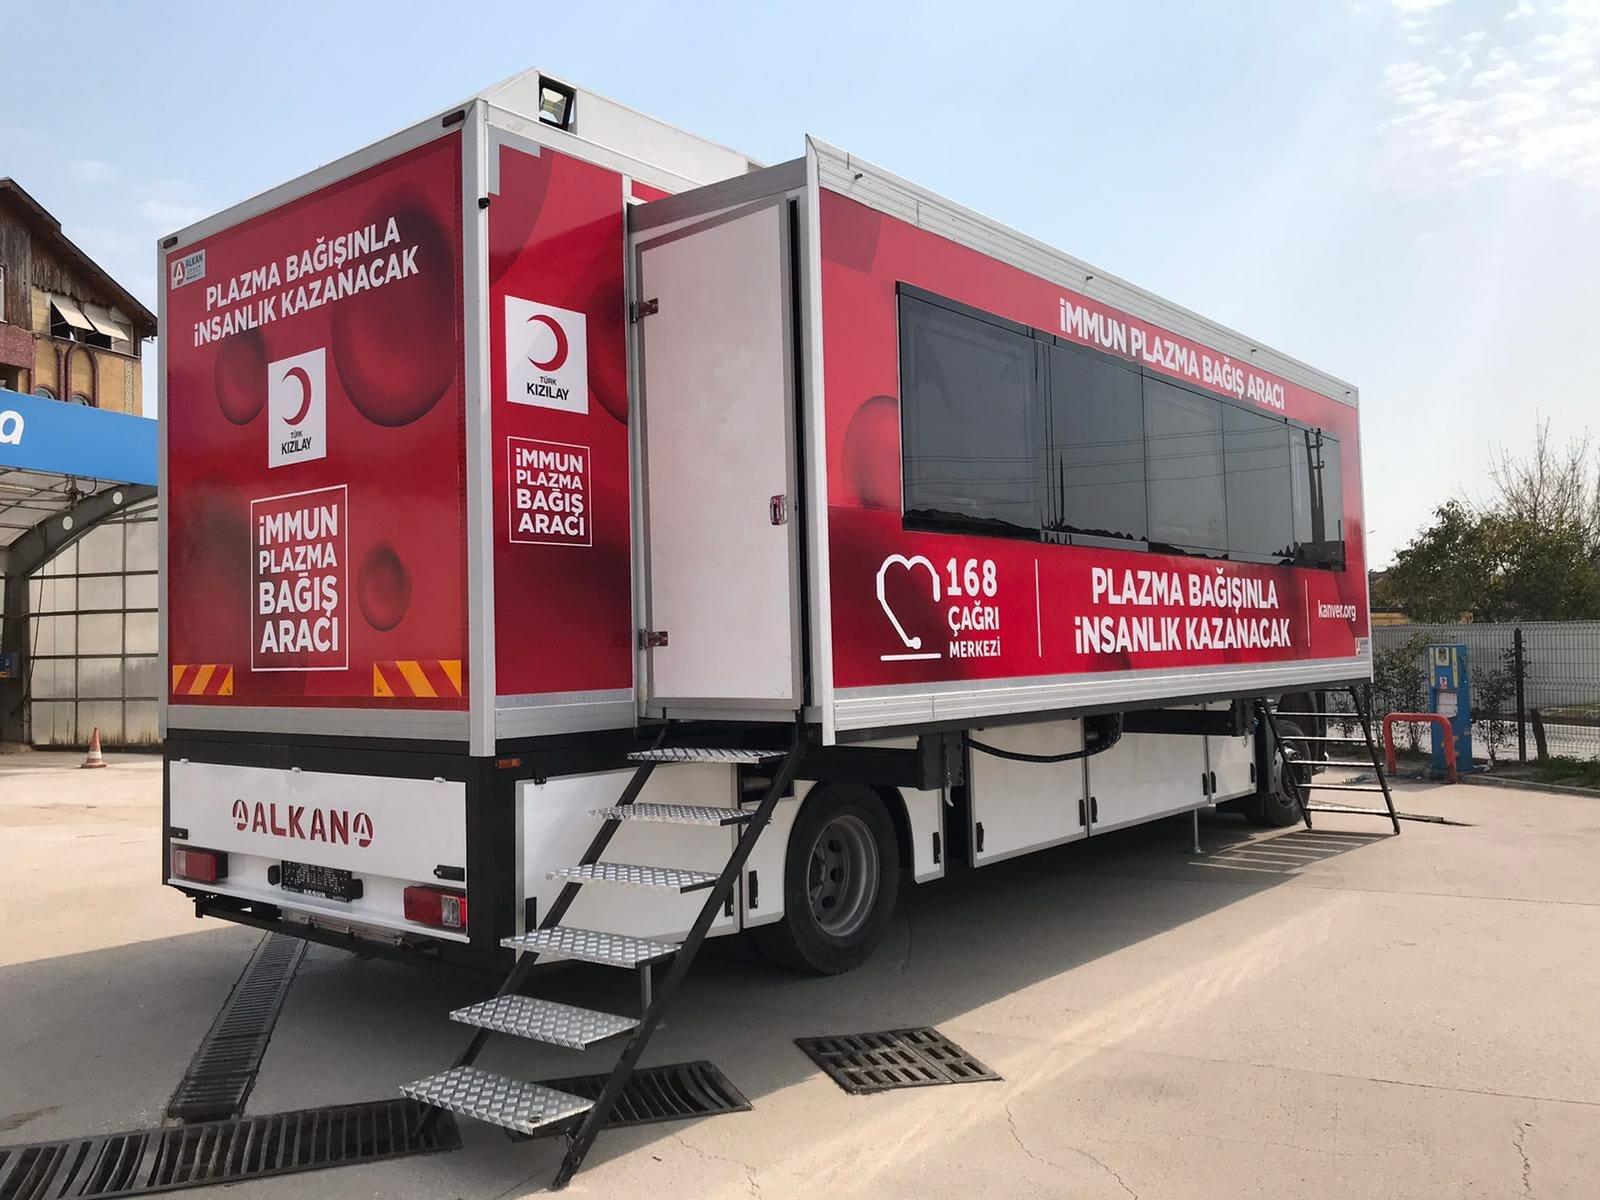 Mobile Immune Plasma Donation Vehicles Set Out